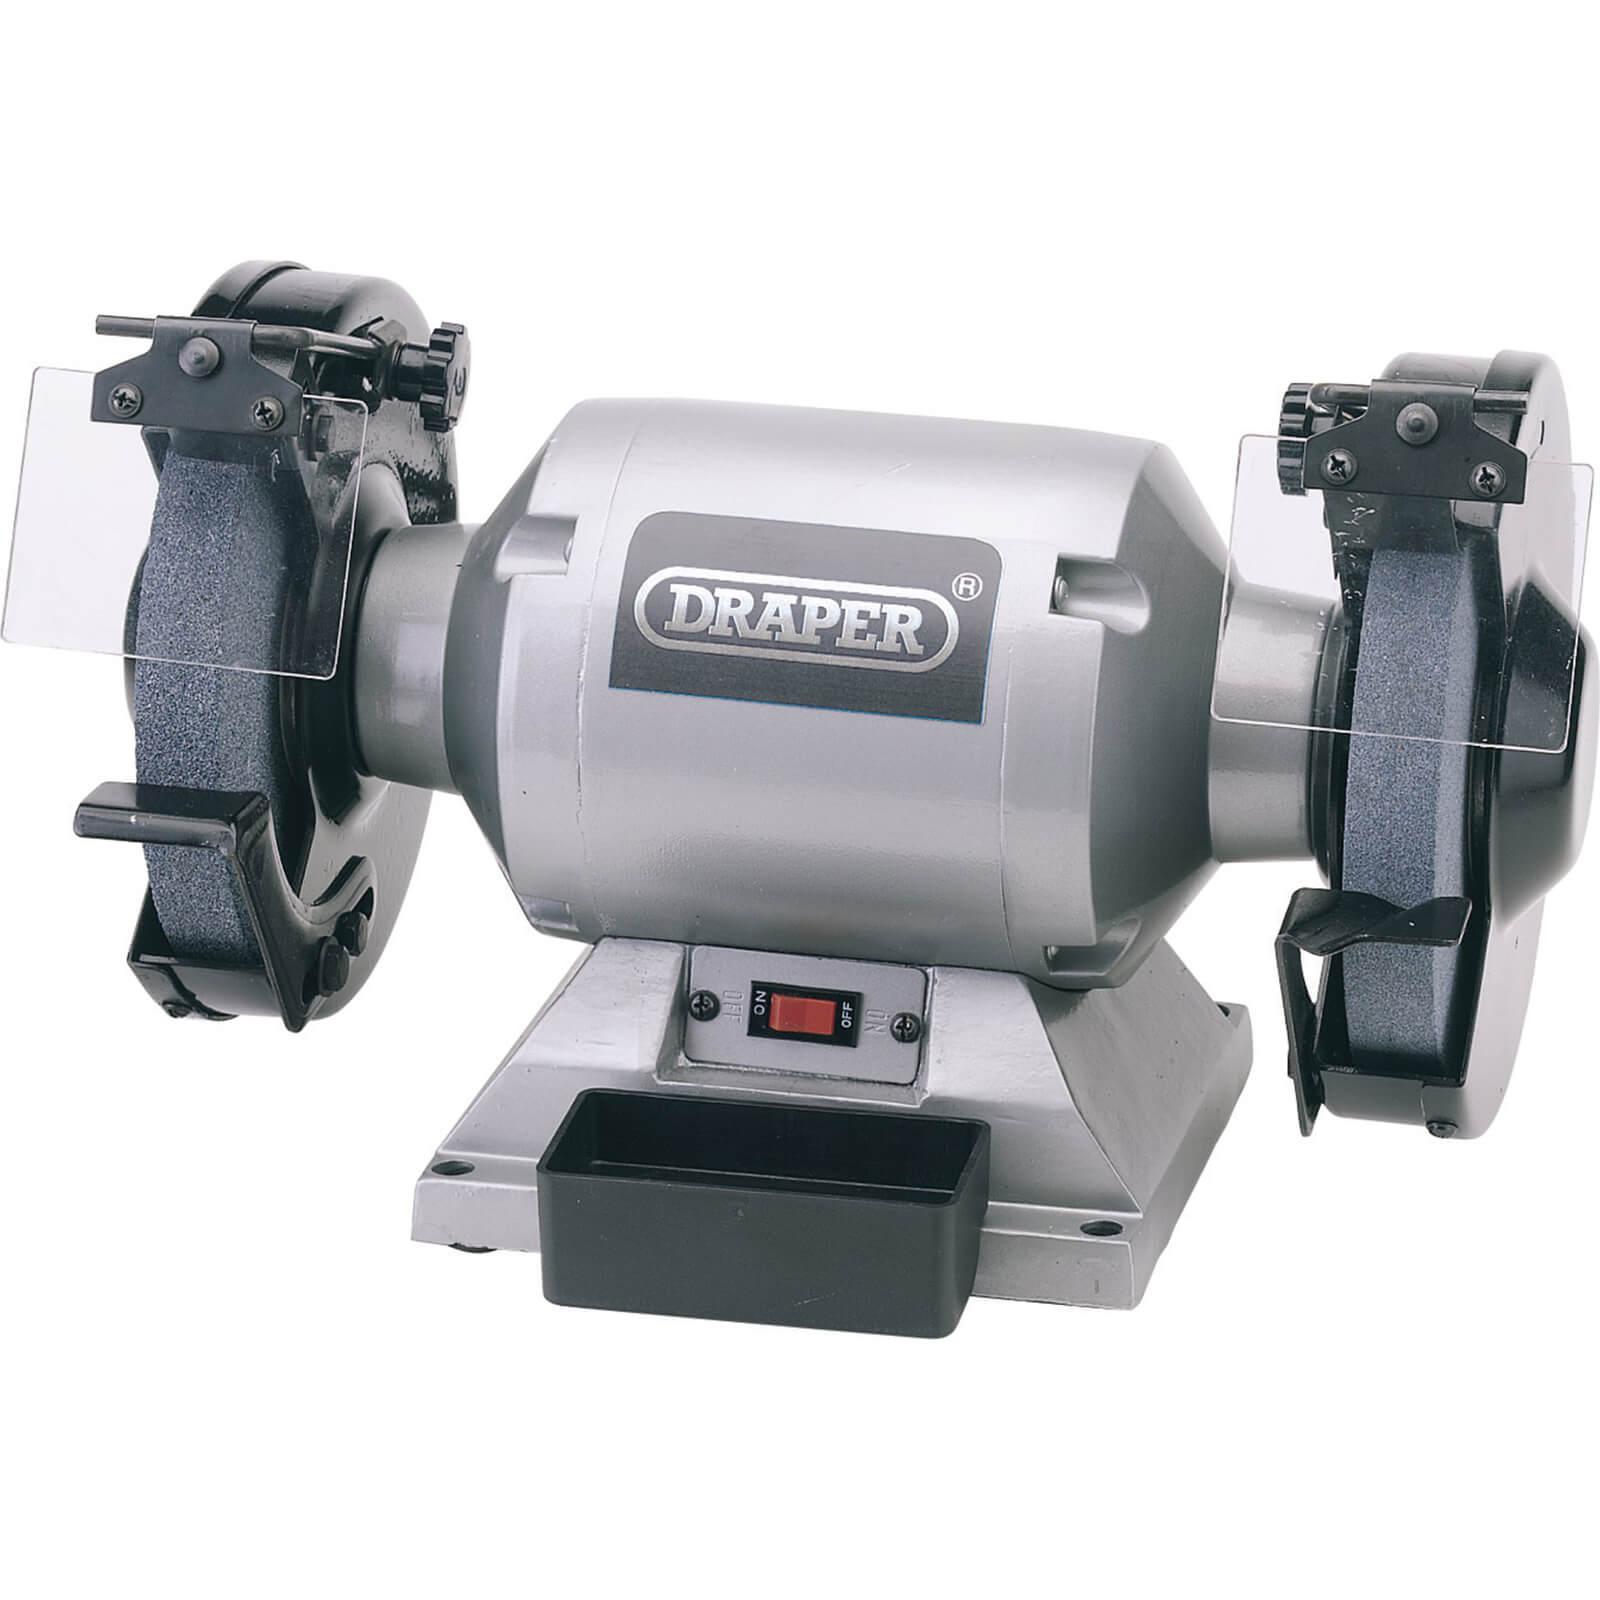 Image of Draper GHD200 200mm Heavy Duty Bench Grinder 240v